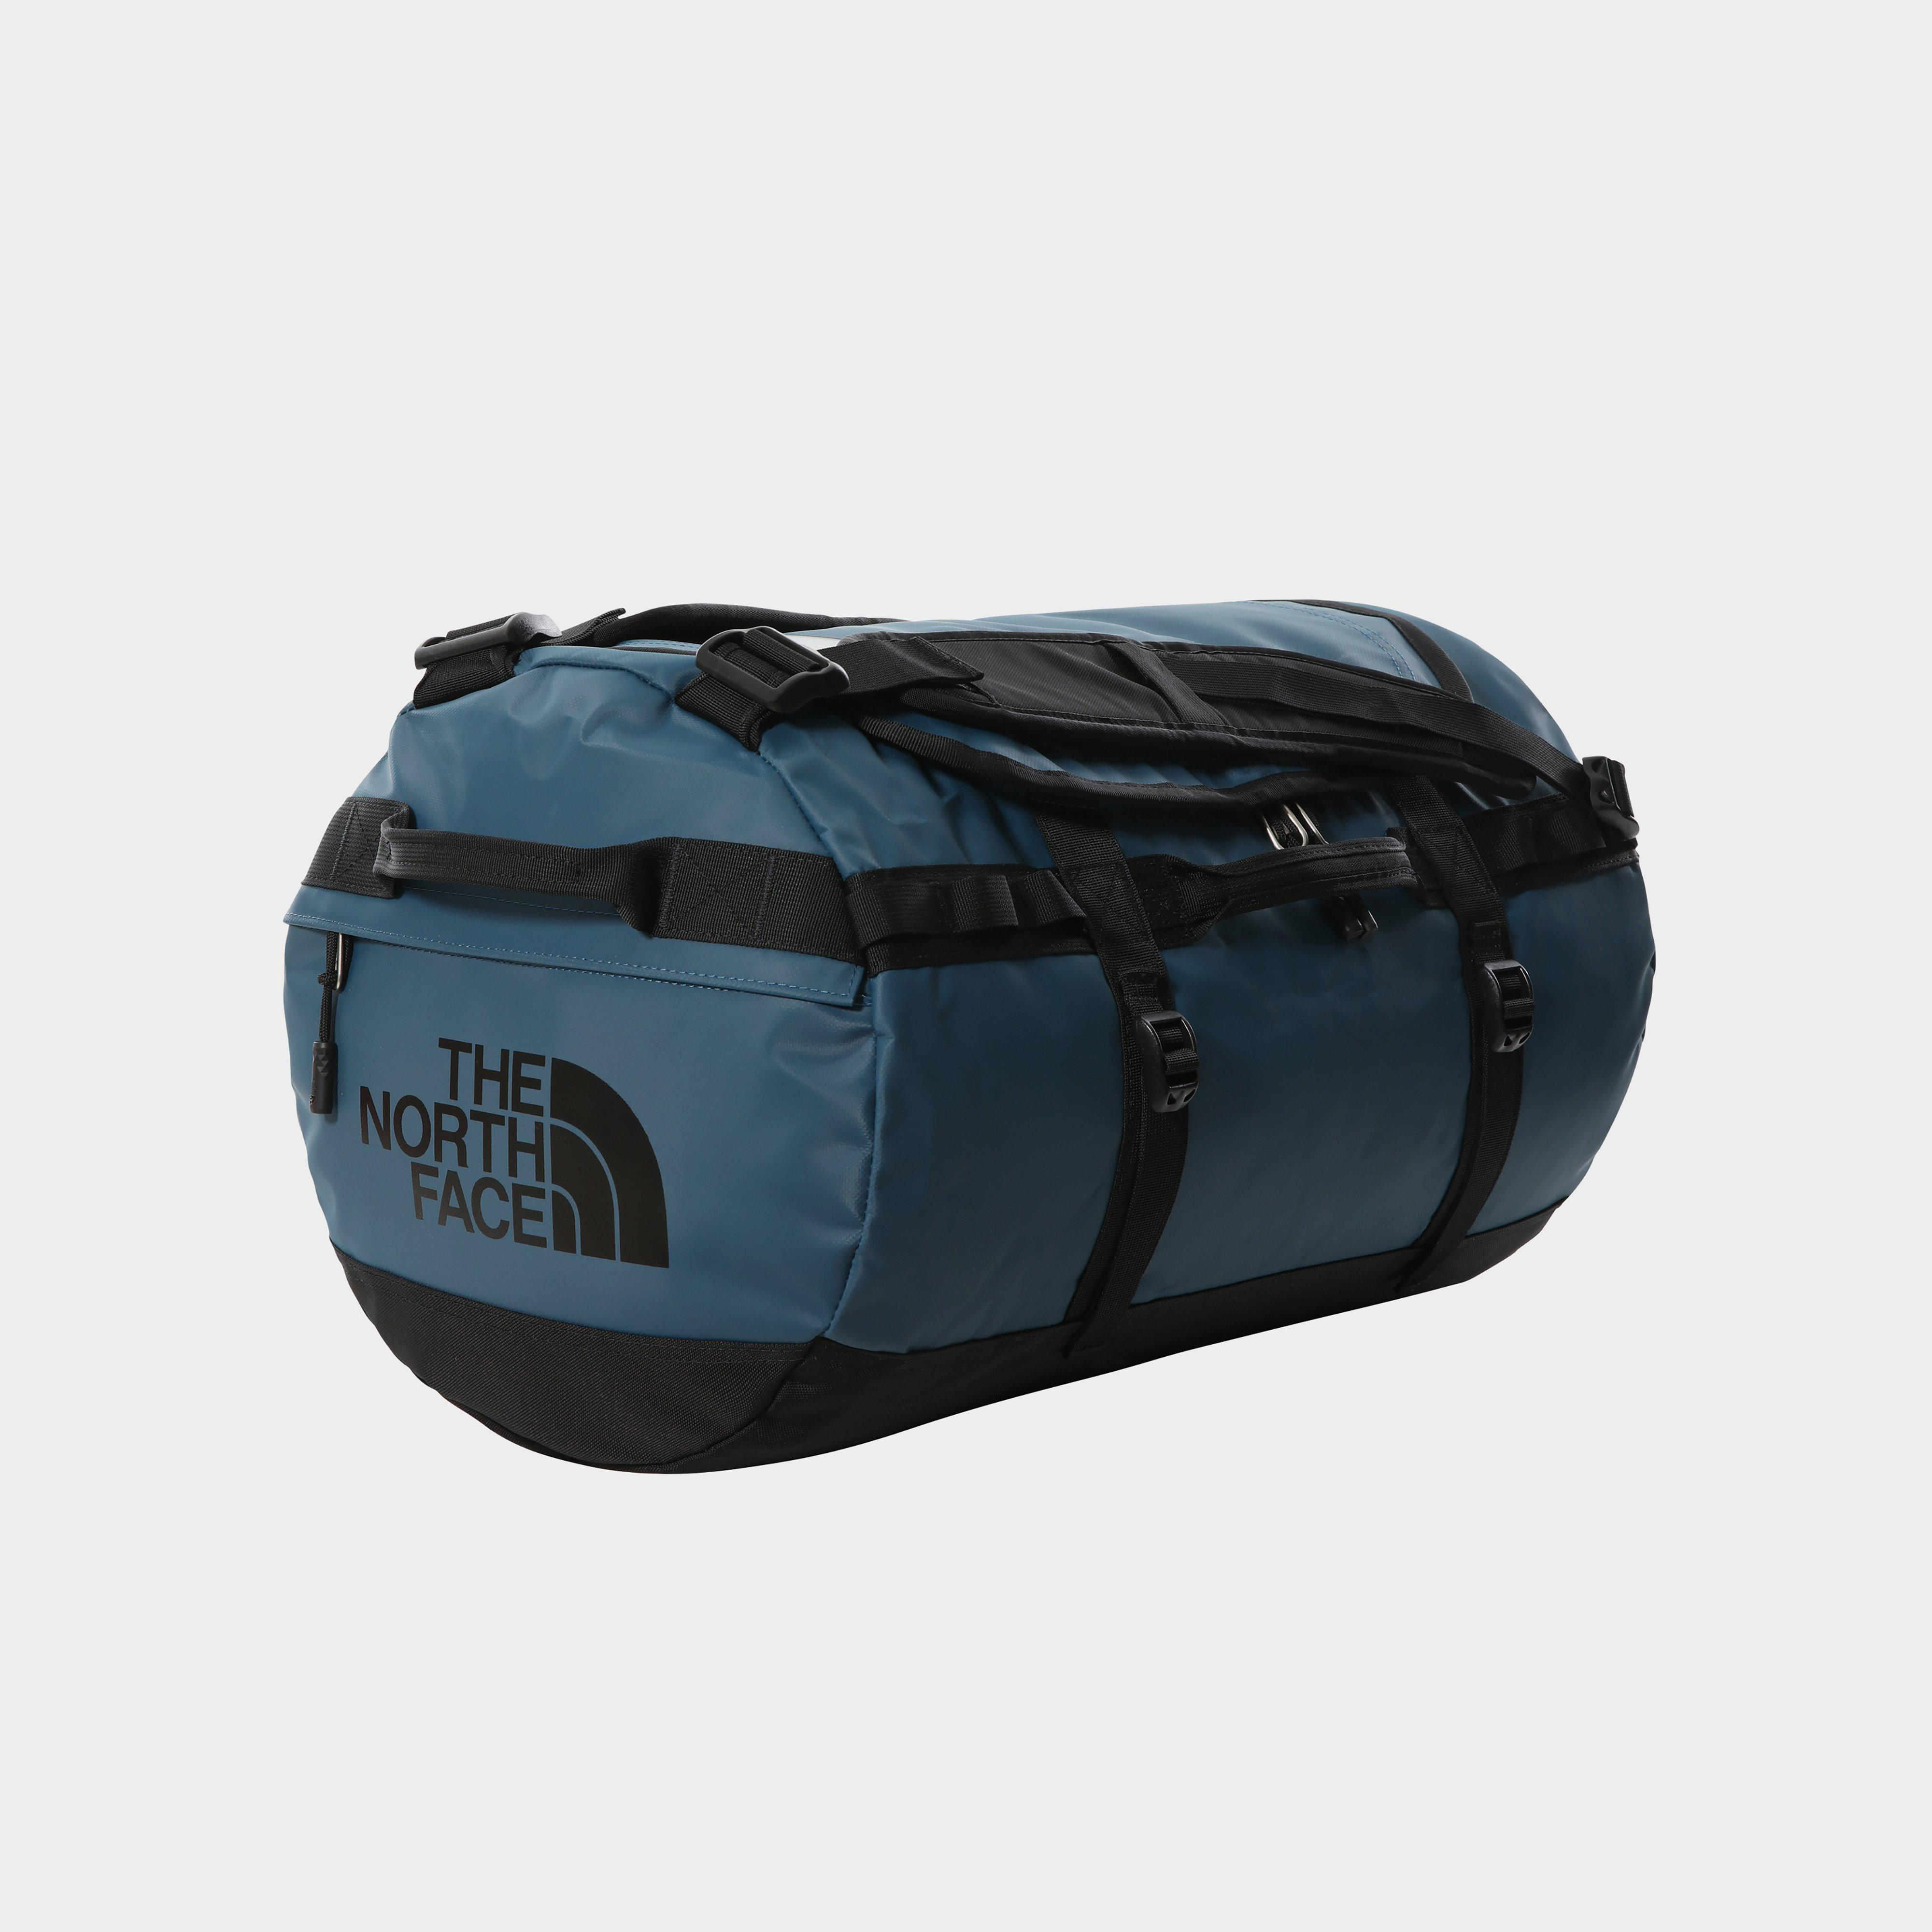 The North Face Basecamp Duffel Bag (Small) - Blue/Dbl, Blue/Dark Blue